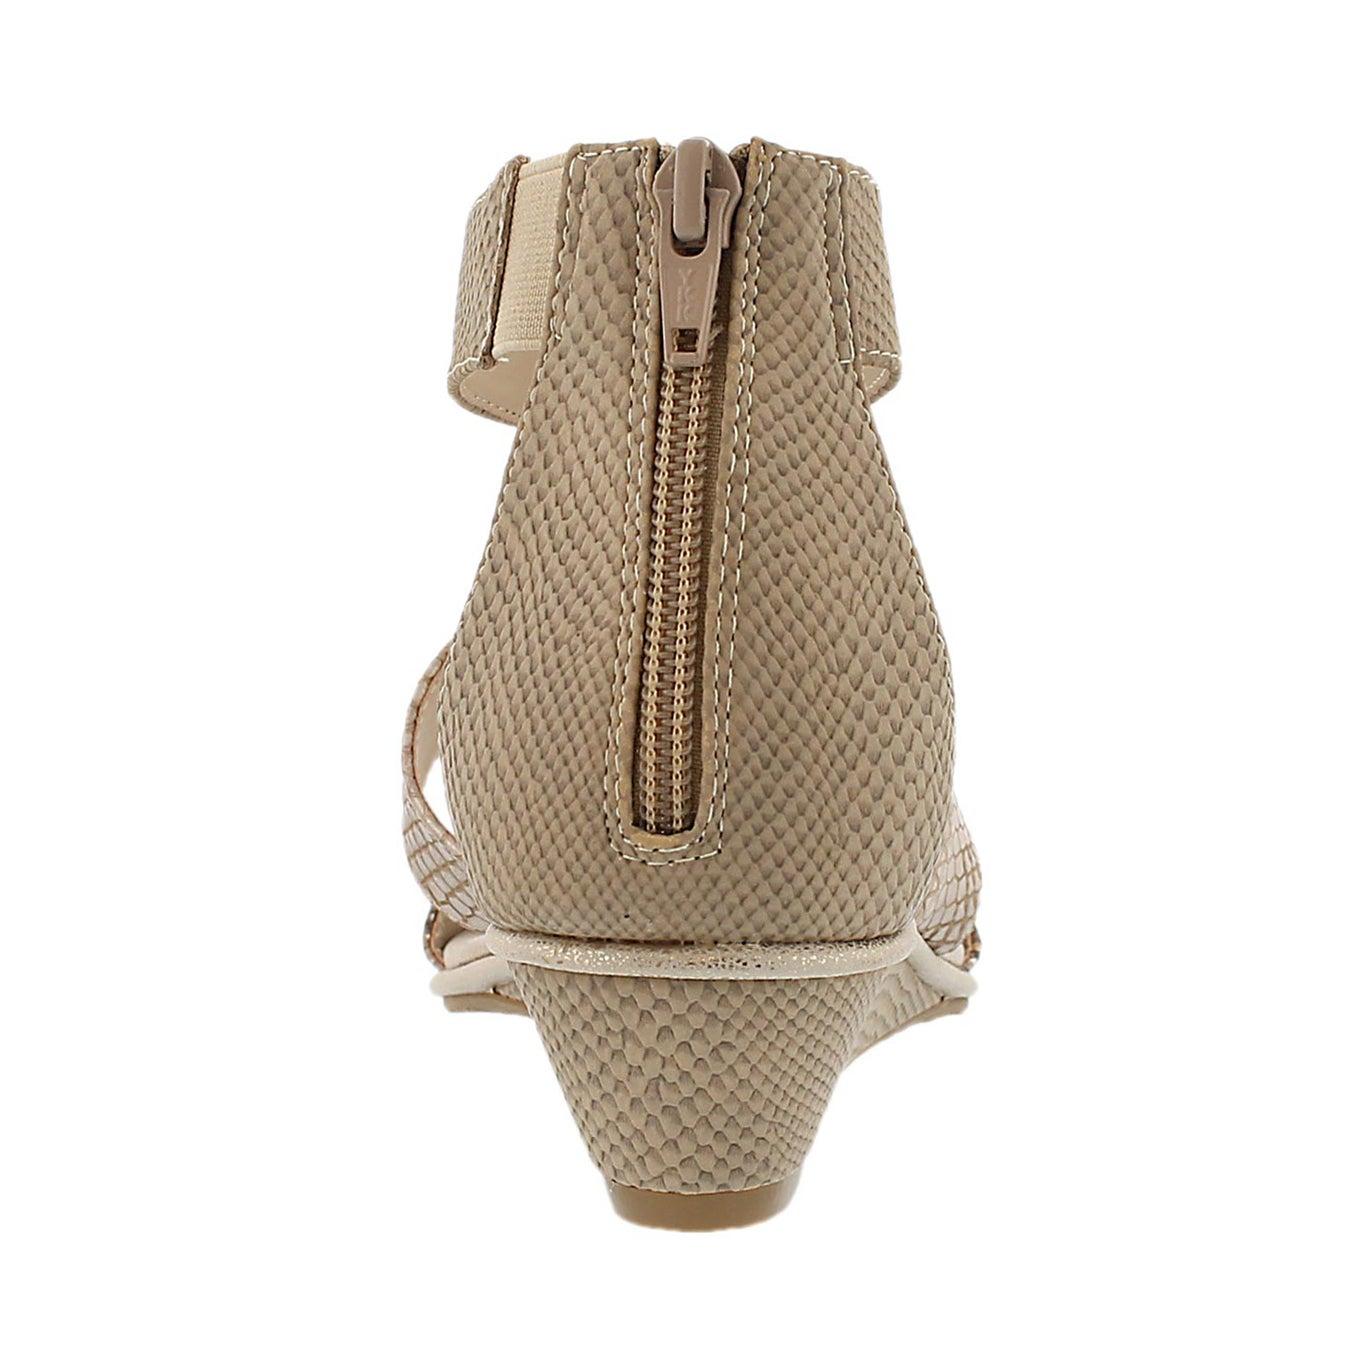 Sandale � bride axiale Bjork, chair, fem